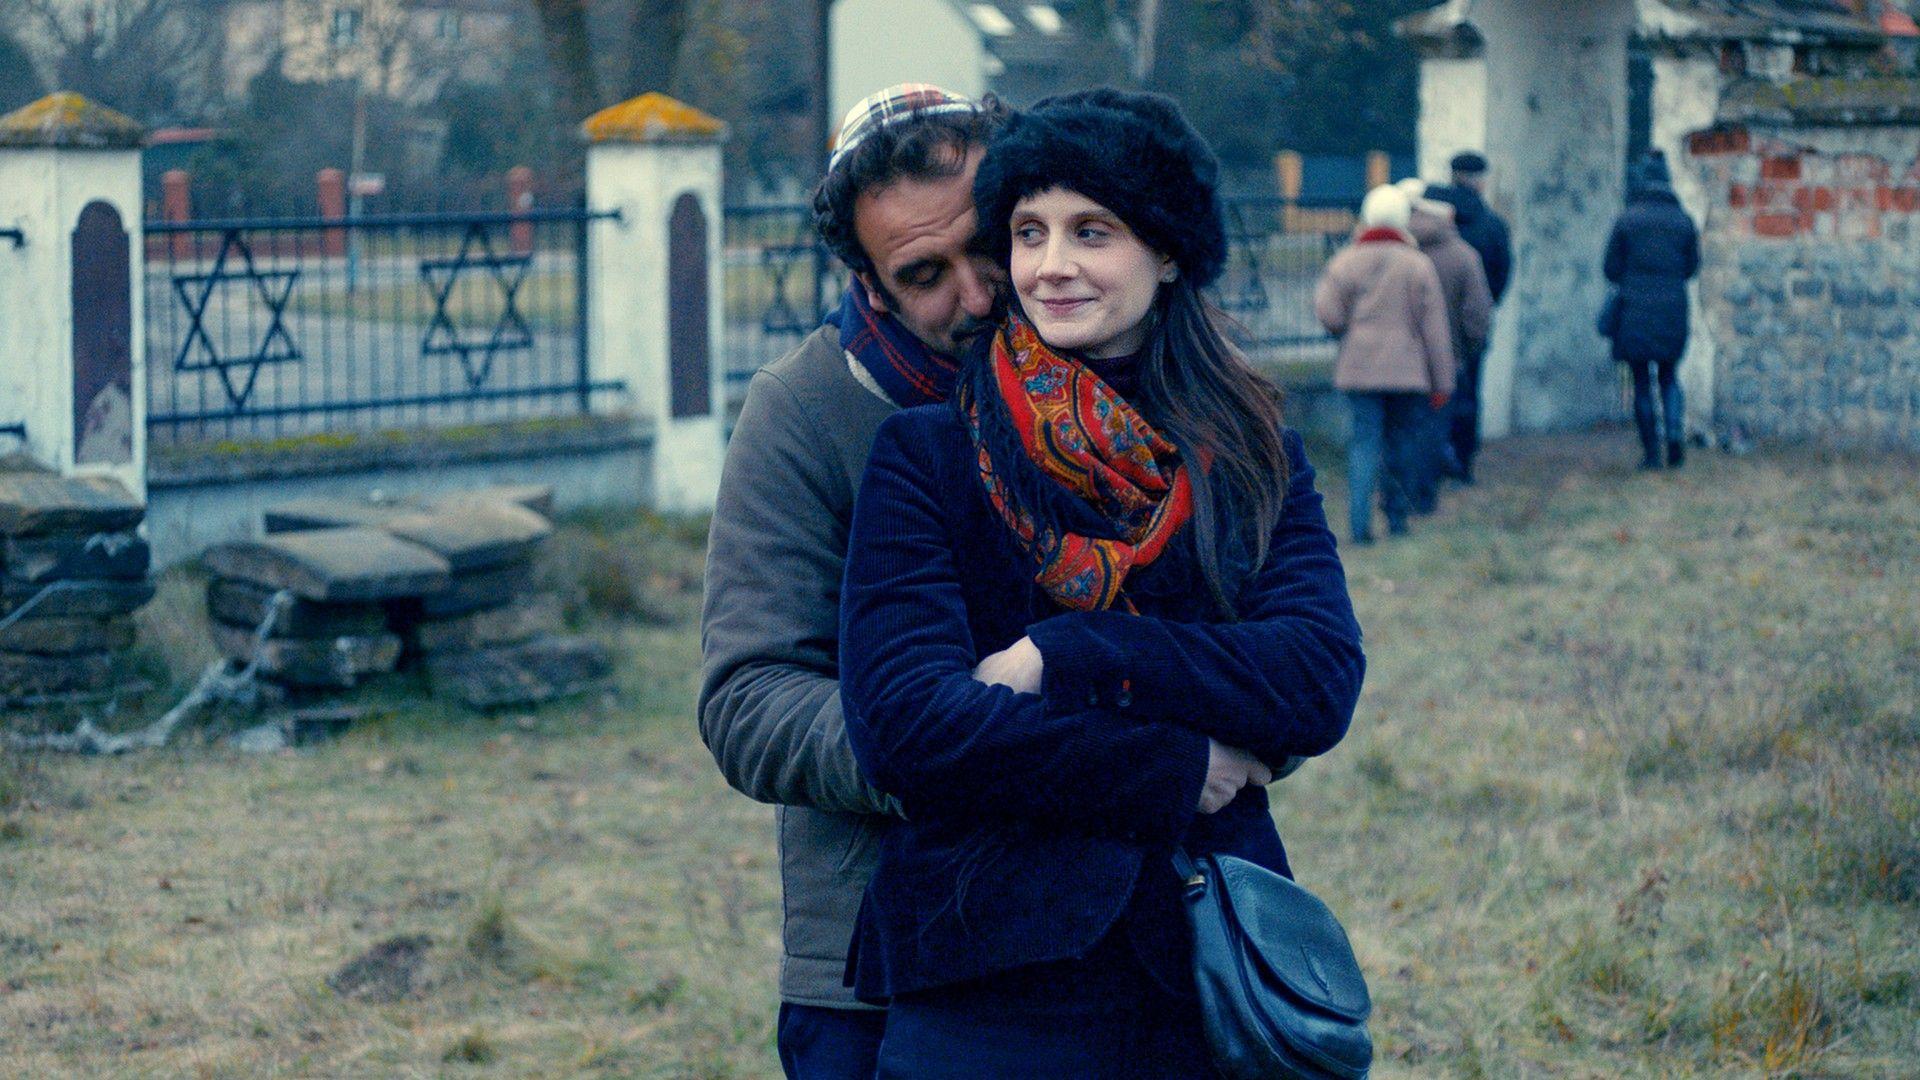 Lune de miel - Partenariat Ciné+